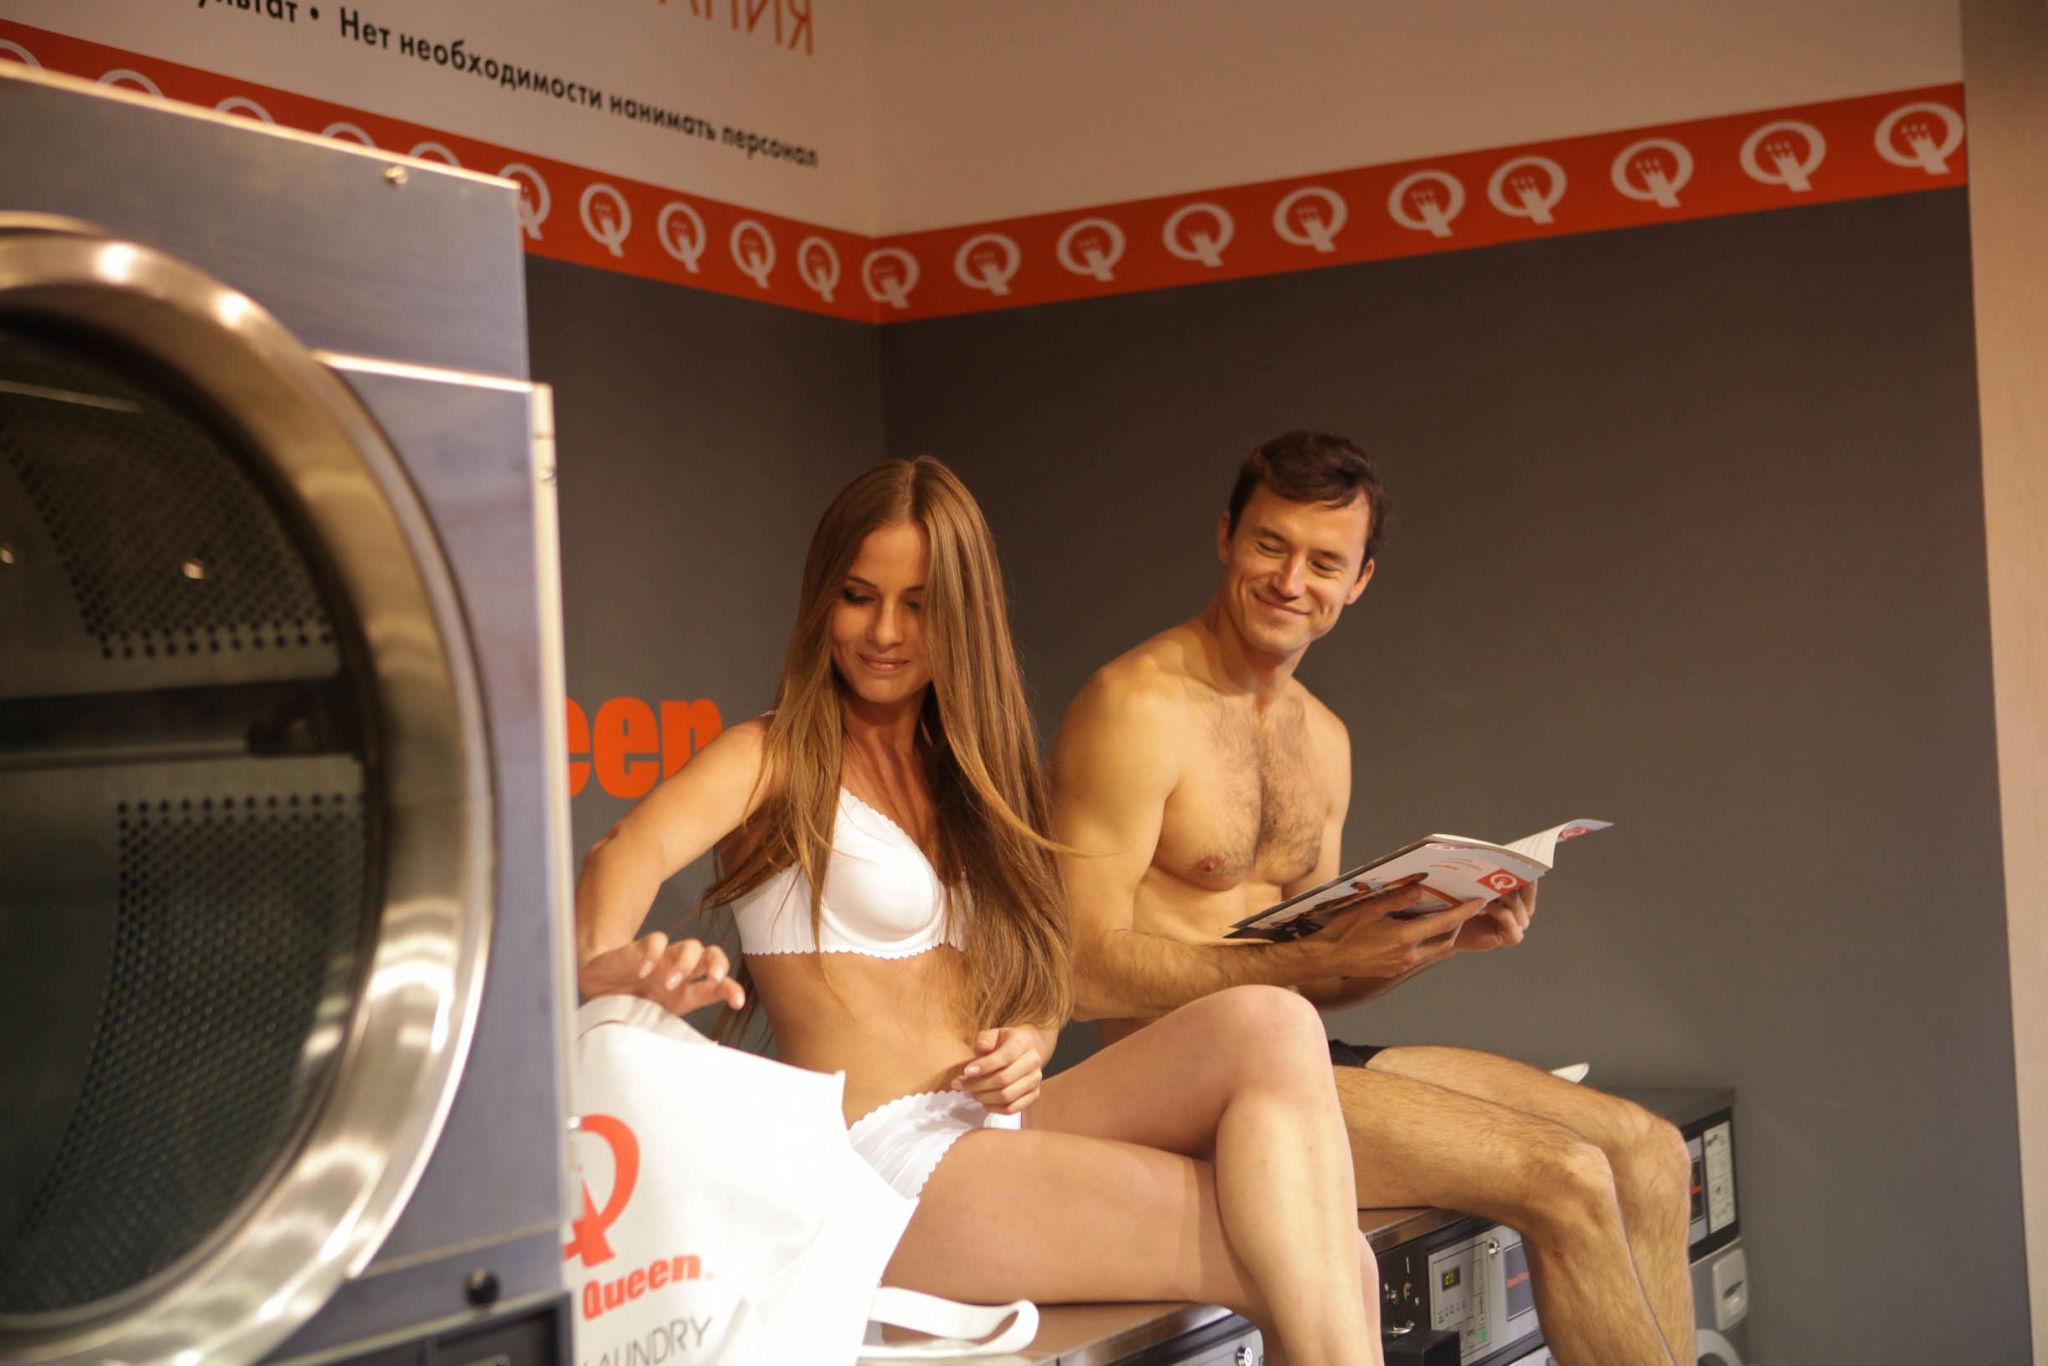 Speed Queen washing machine demonstration 2 in Russia